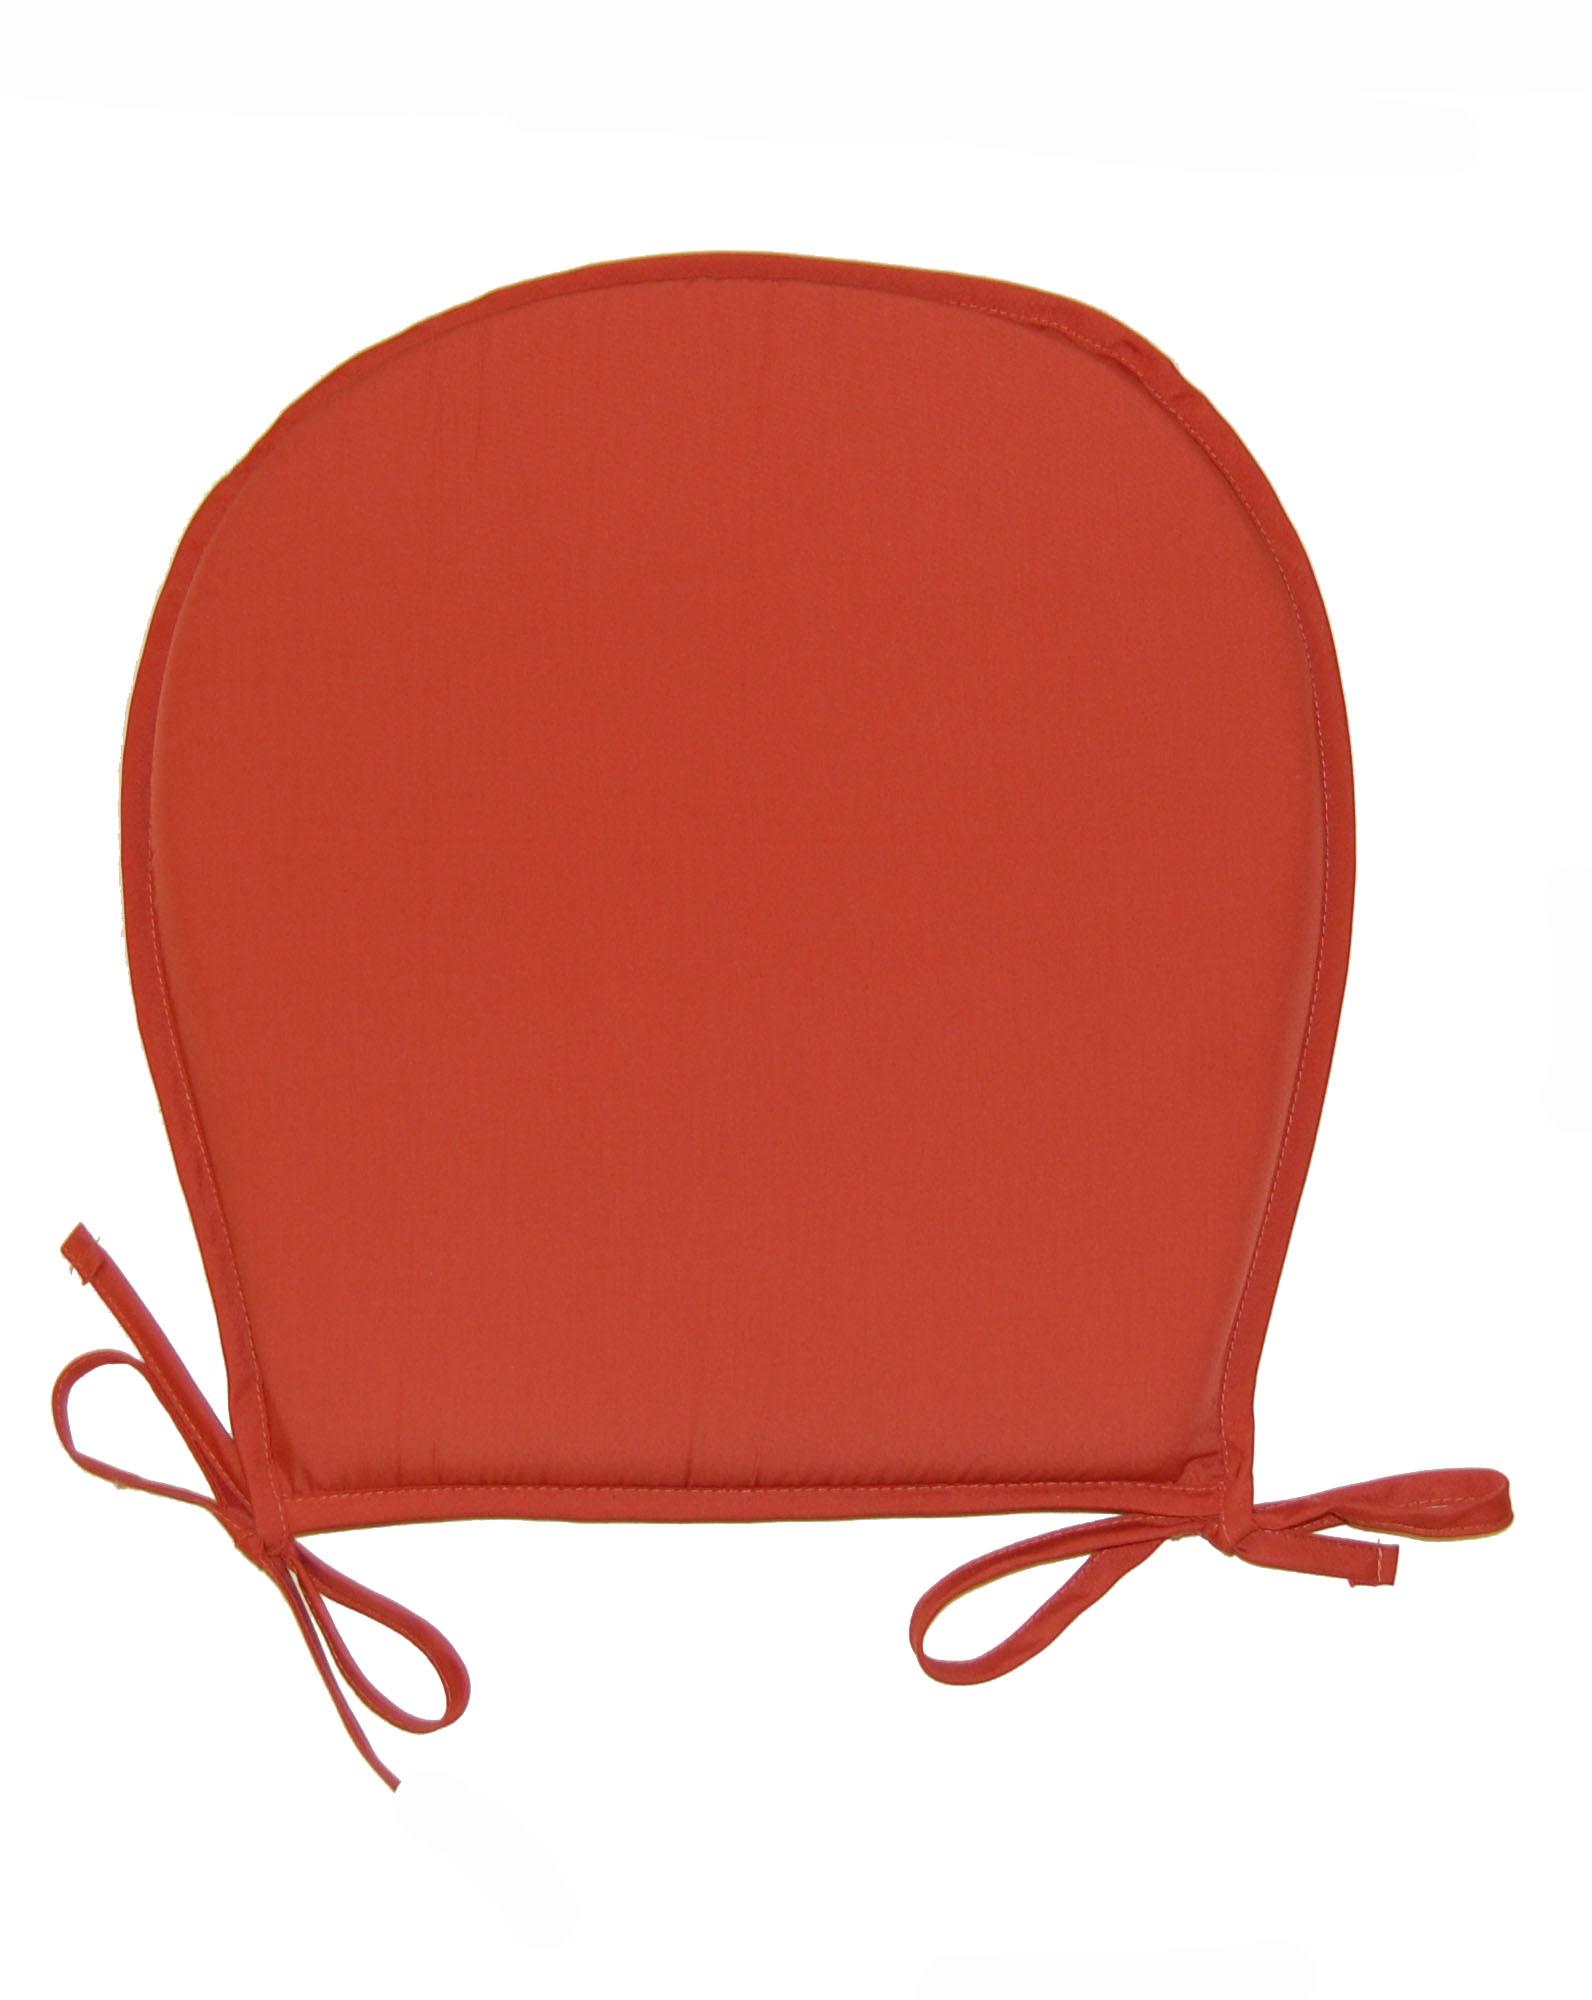 chair pads kitchen all modern outdoor dining chairs seat plain round garden furniture